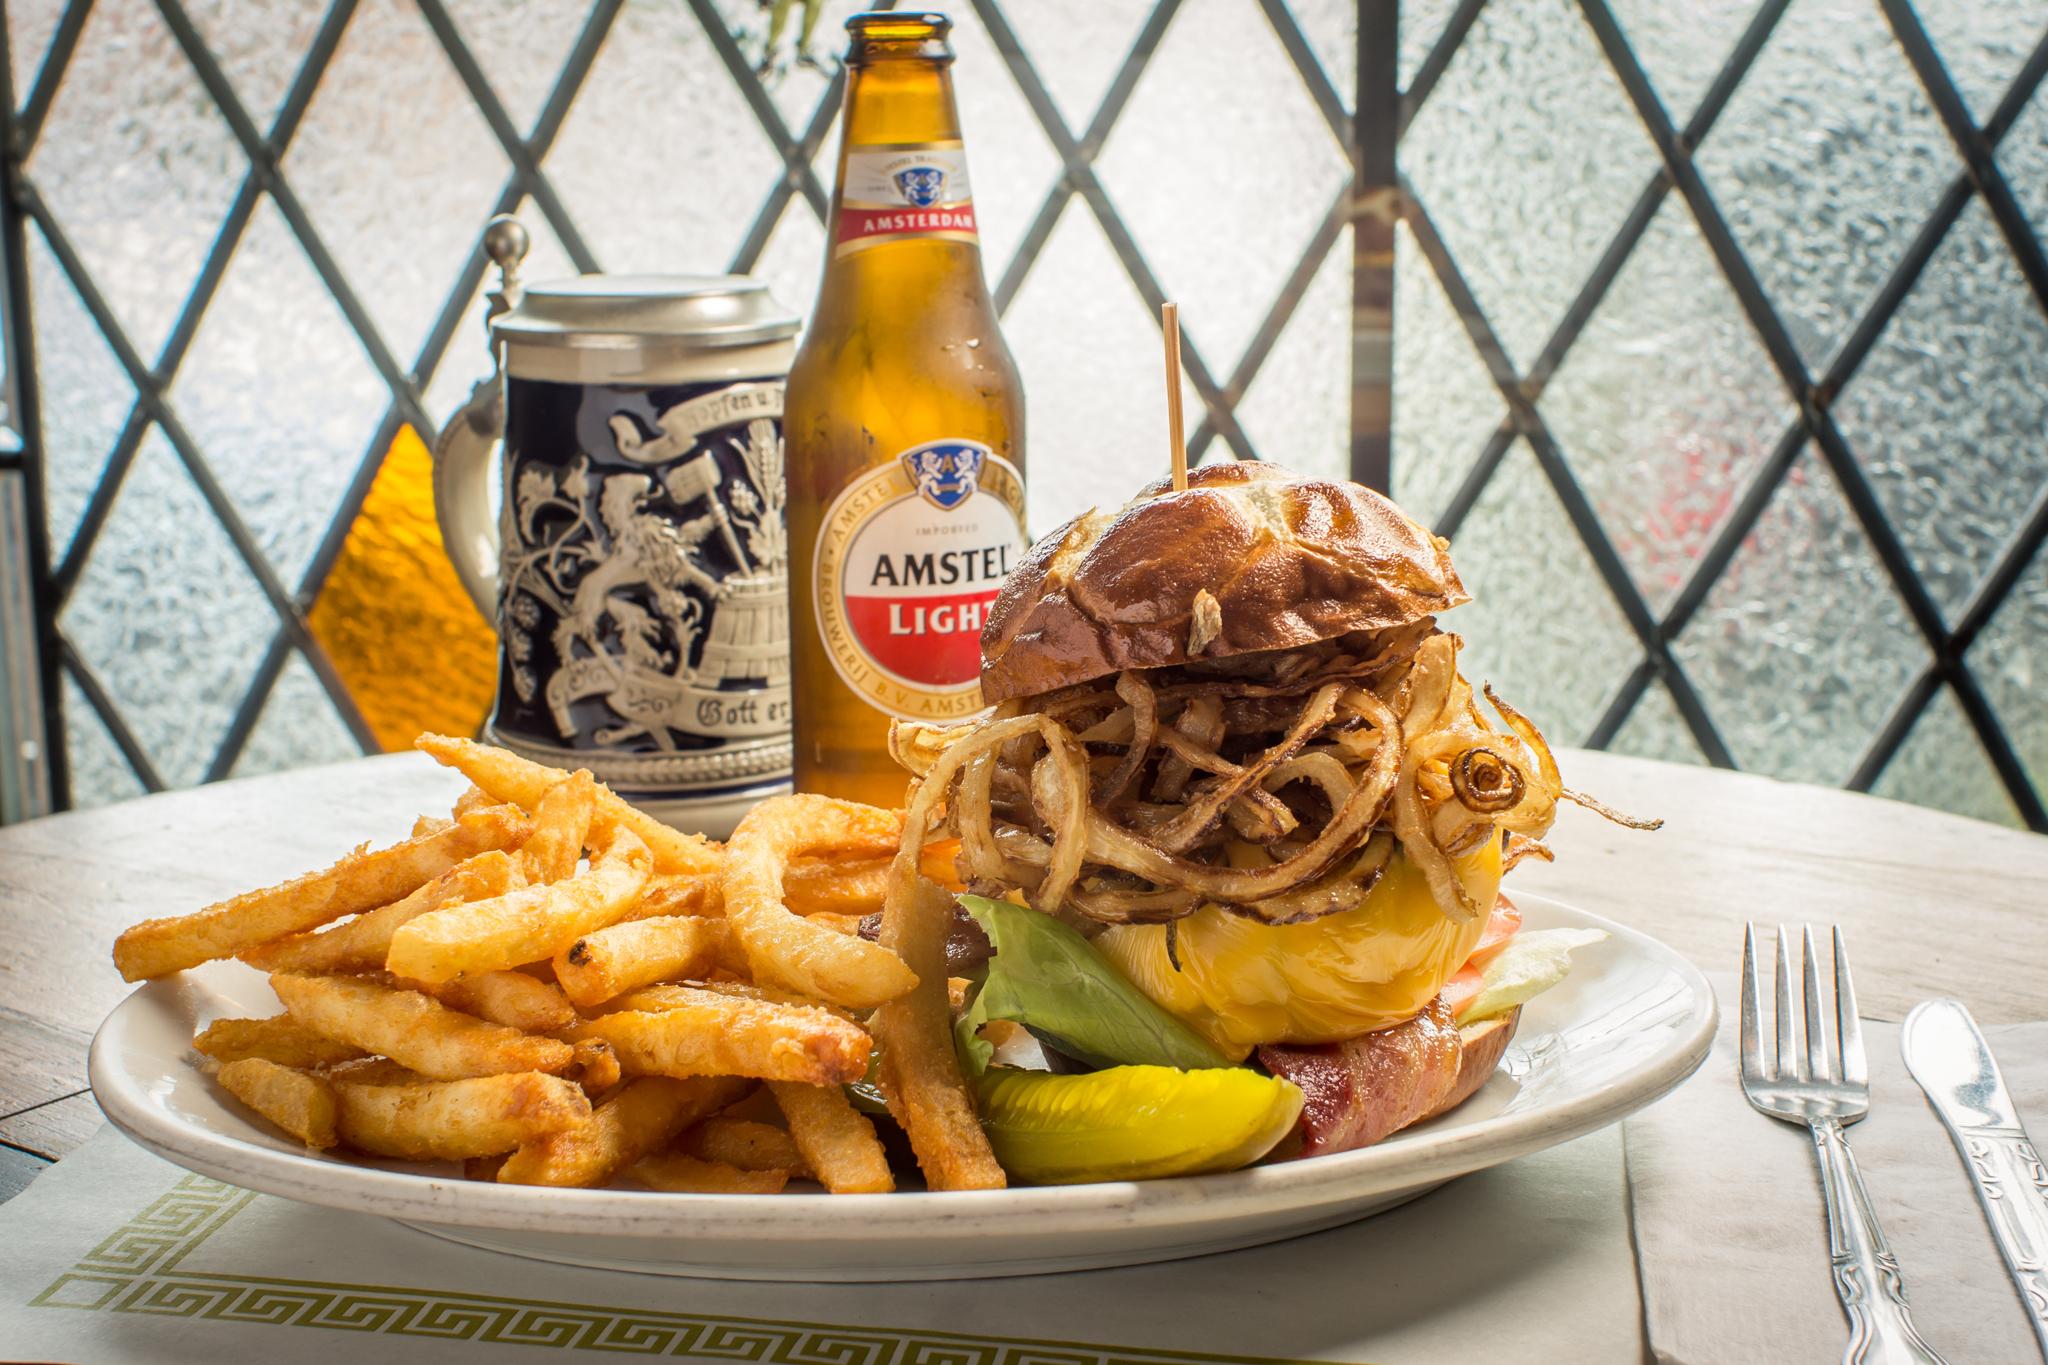 Nürn-Burger at Nürnberger Bierhaus